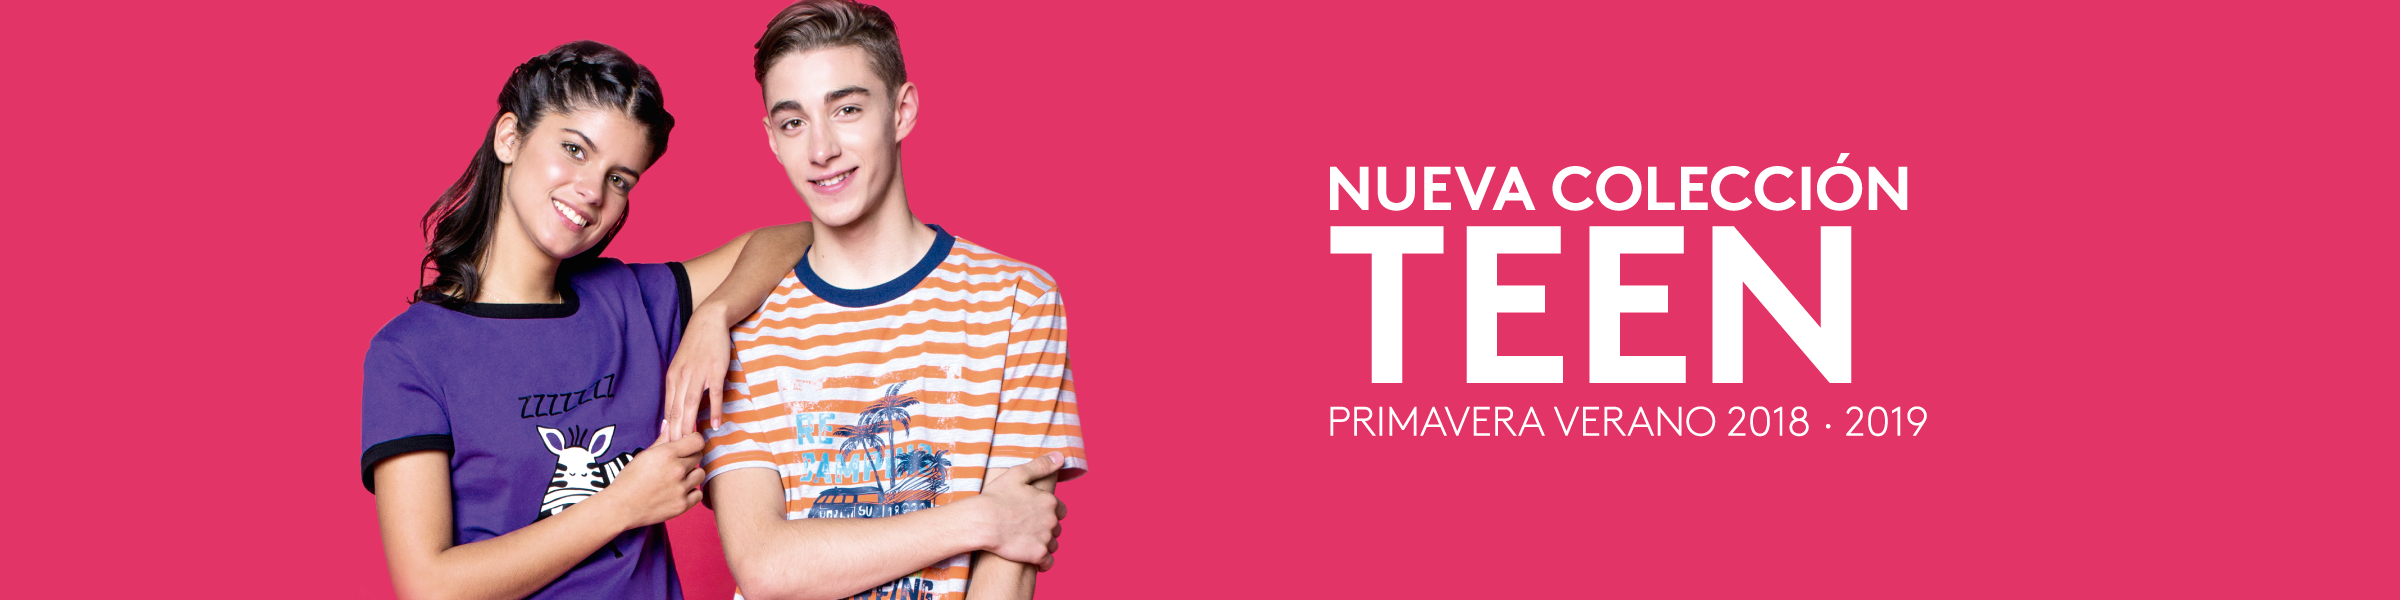 banner-principal